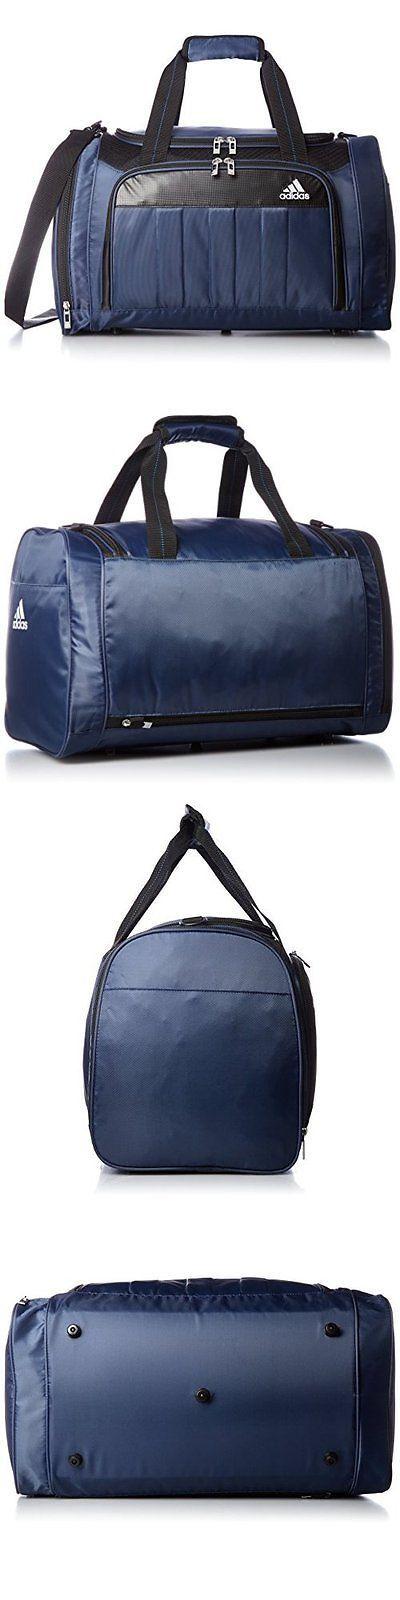 Bag Tags 173516: Adidas Golf Boston Bag 4 H30 X W49 X D26 Cm Awr93 Navy A10234 -> BUY IT NOW ONLY: $99.8 on eBay!